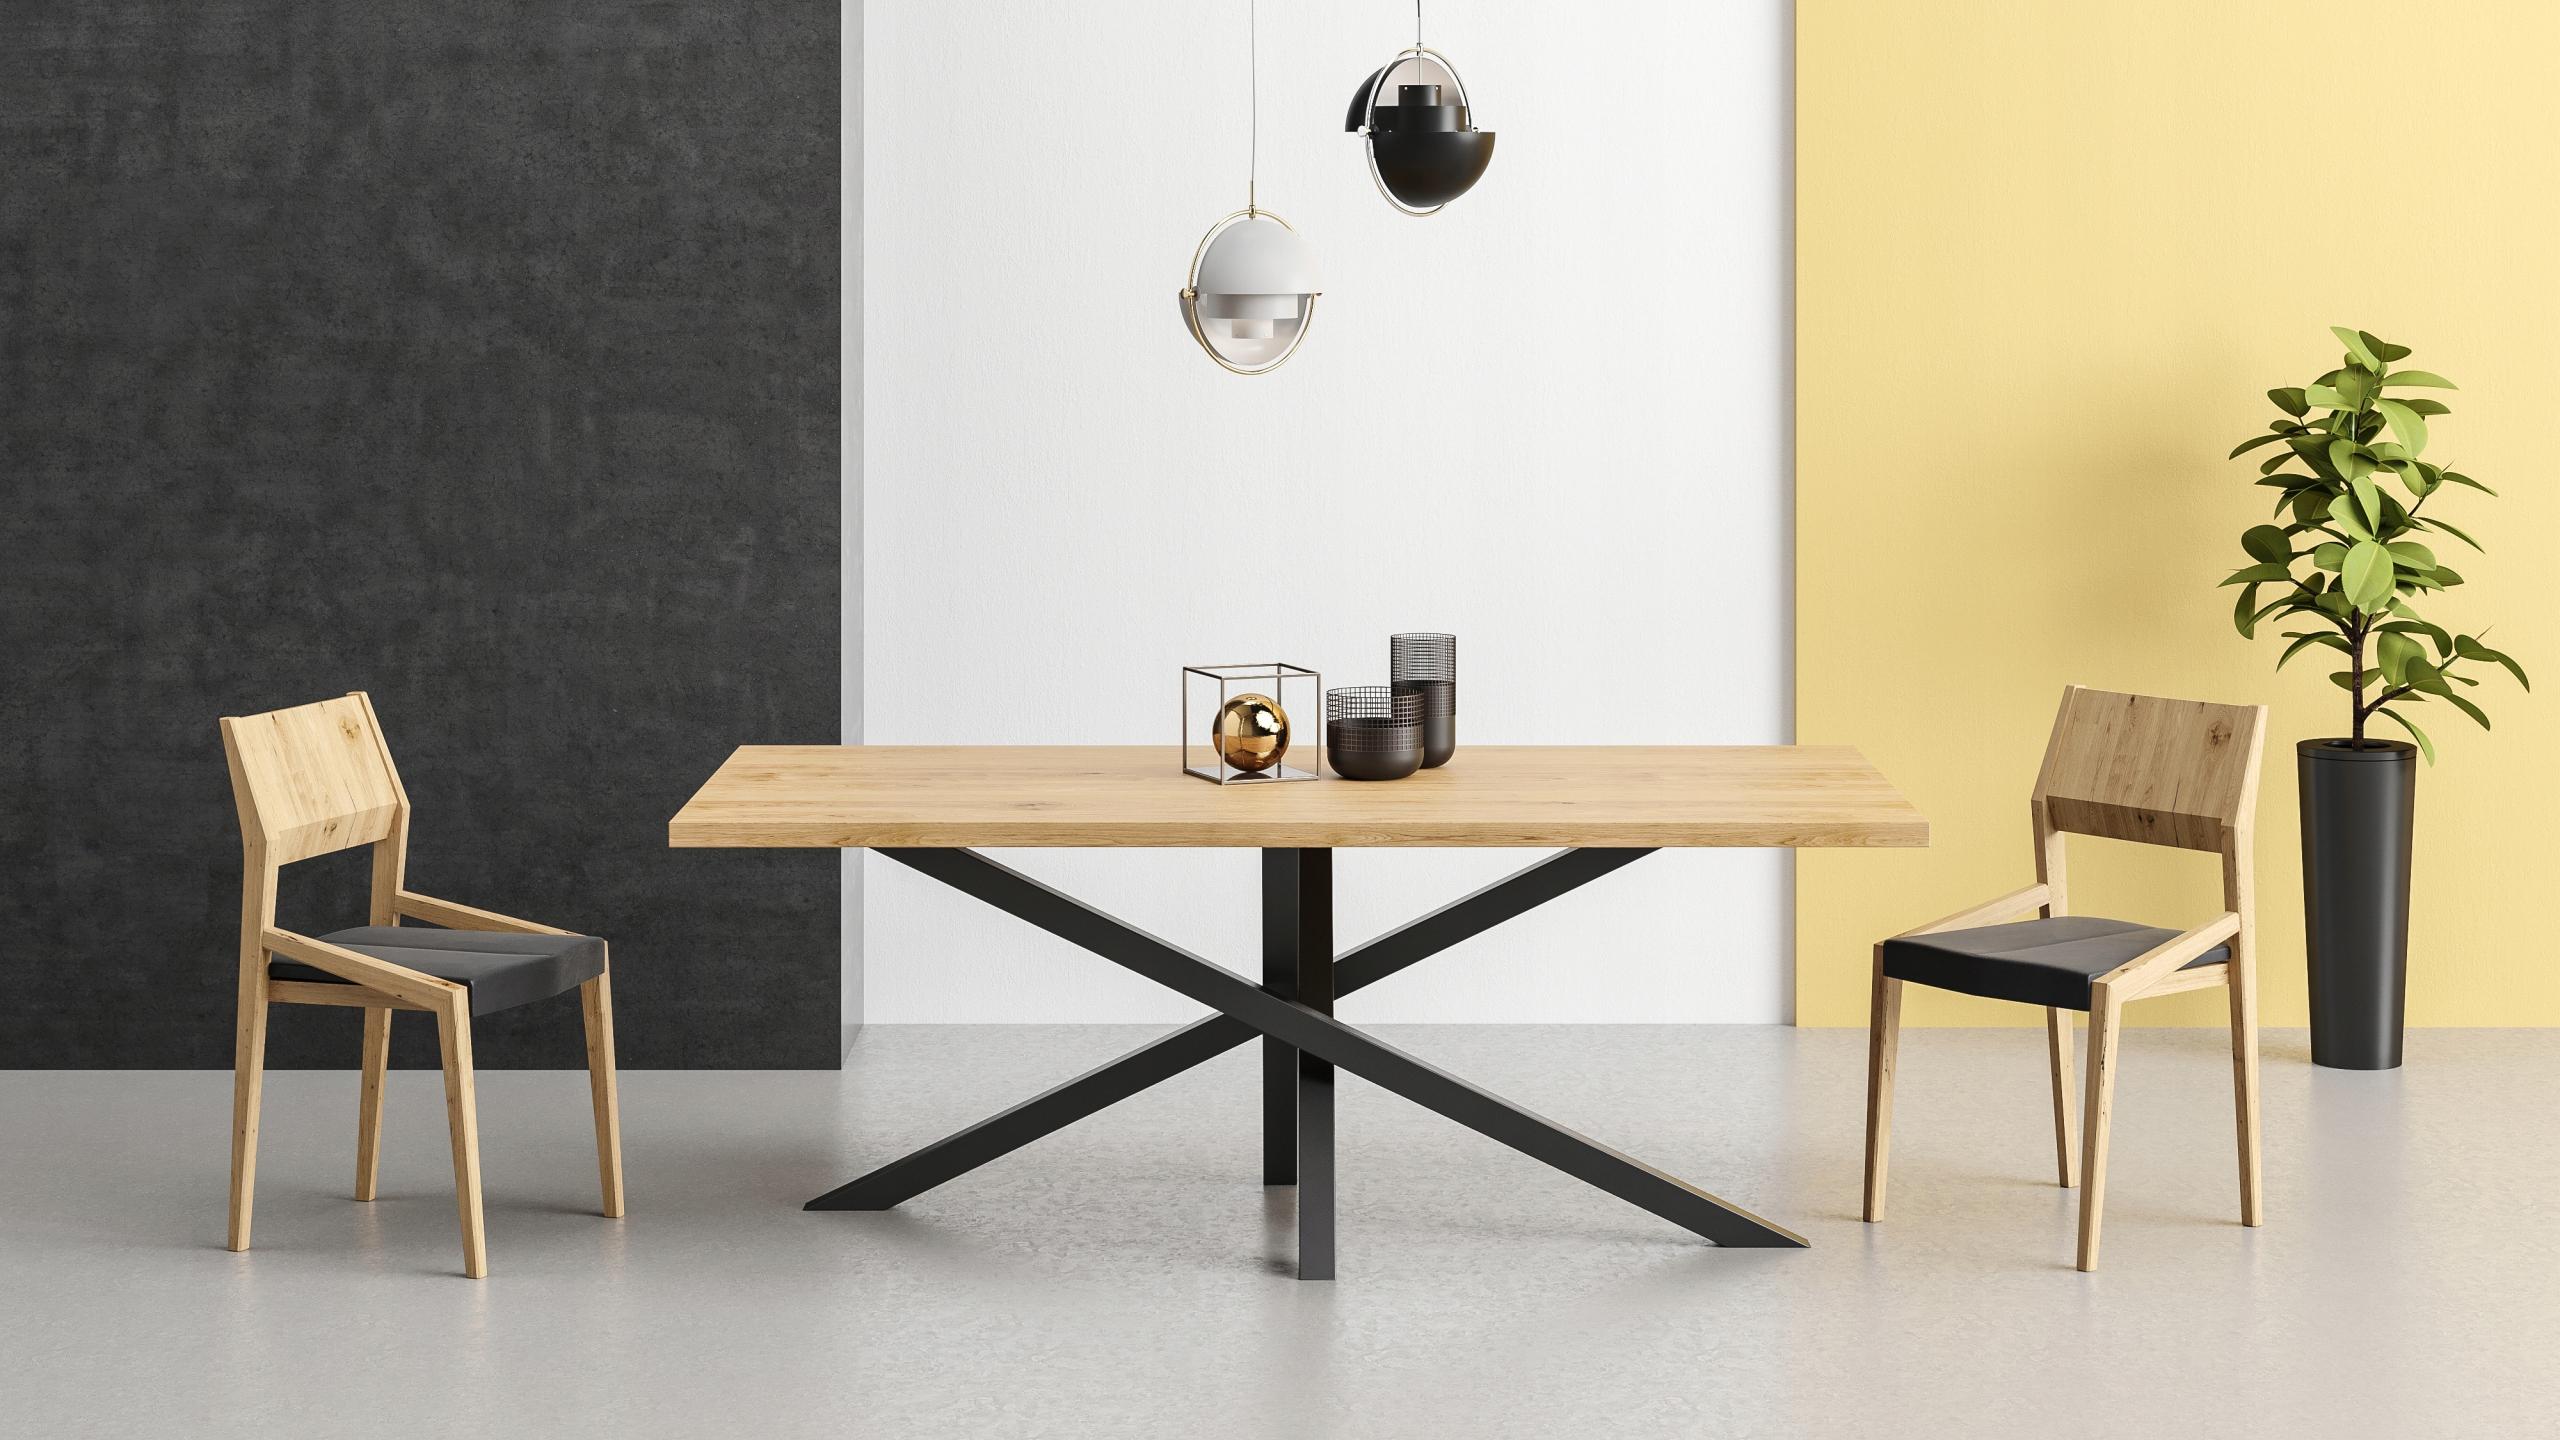 Stôl v štýle LOFT, RETRO, VINTAGE 100 x 200 SLANT